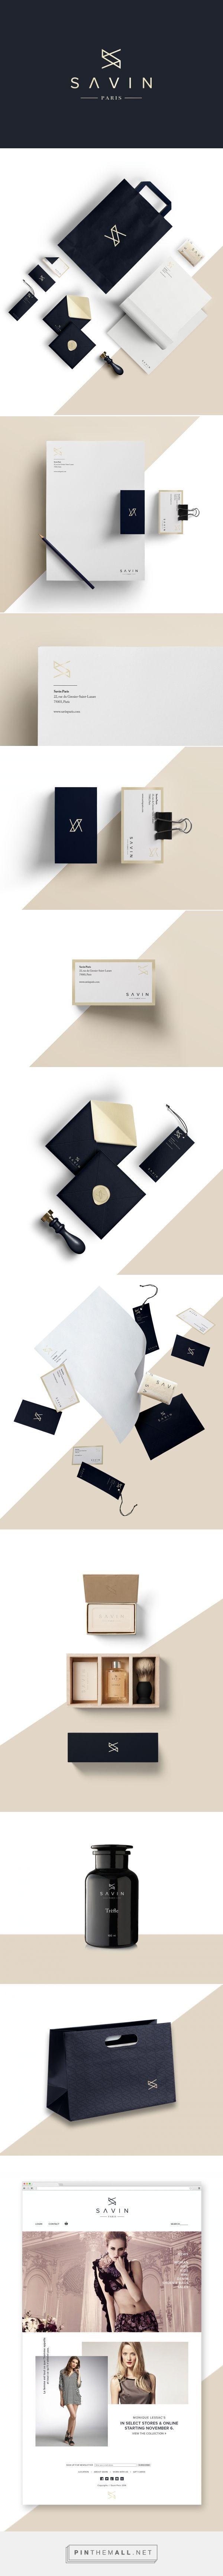 Savin Paris - fashion apparel on Behance - branding stationary corporate identity visual design label business card letterhead bag packaging website enveloppe logo minimalistic graphic design: